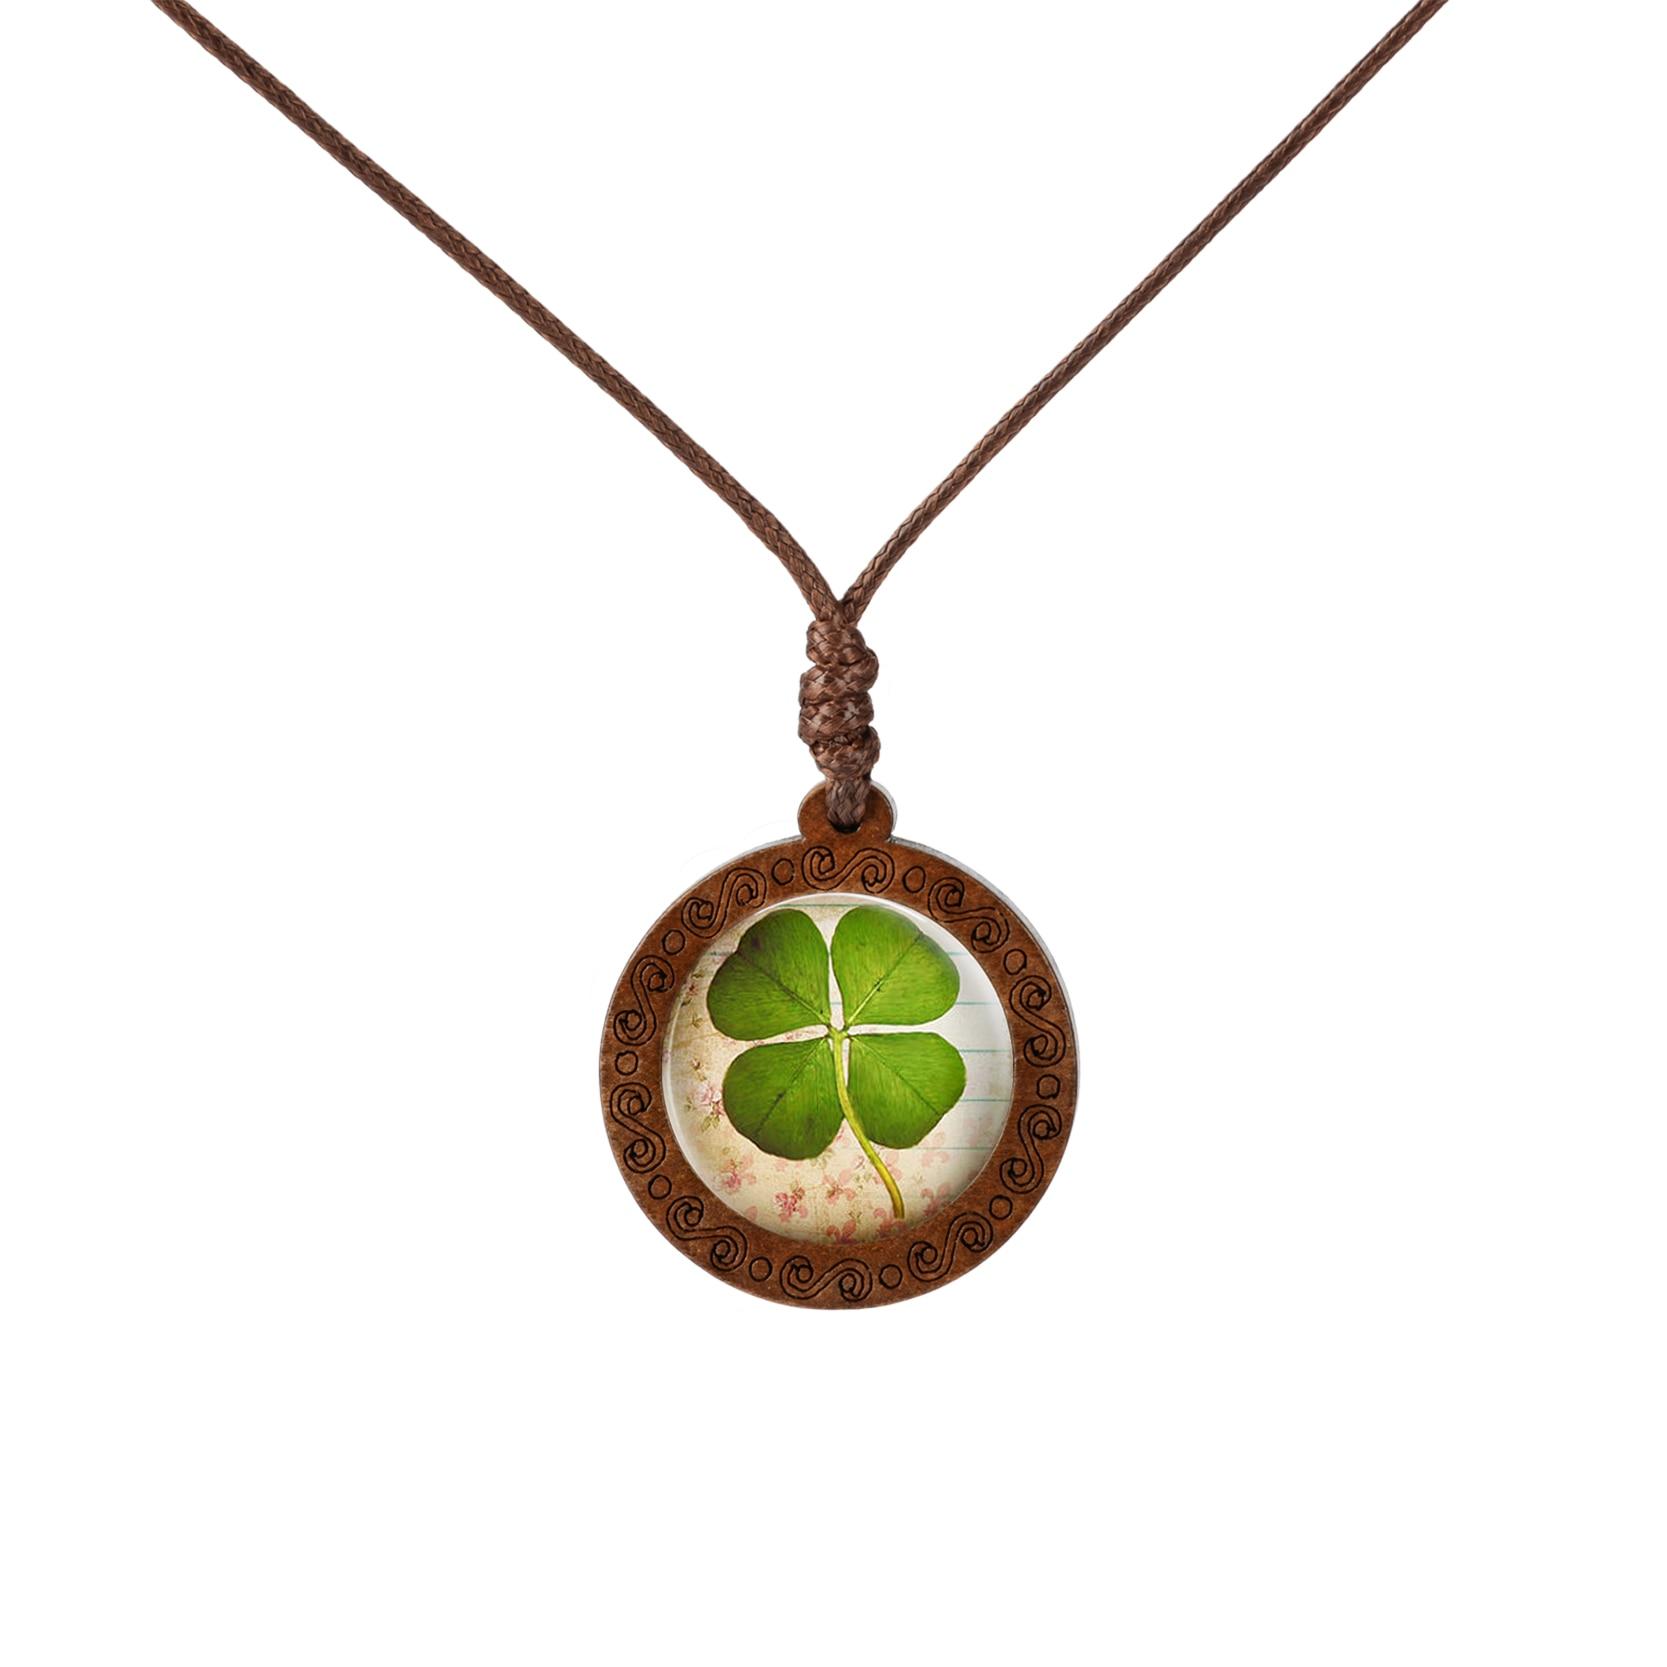 Fashion Wood Necklace Dandelion Four-leaf Clover Glass Cabochon Necklace Sun Pattern Jewelry Art Picture Necklace Pendant